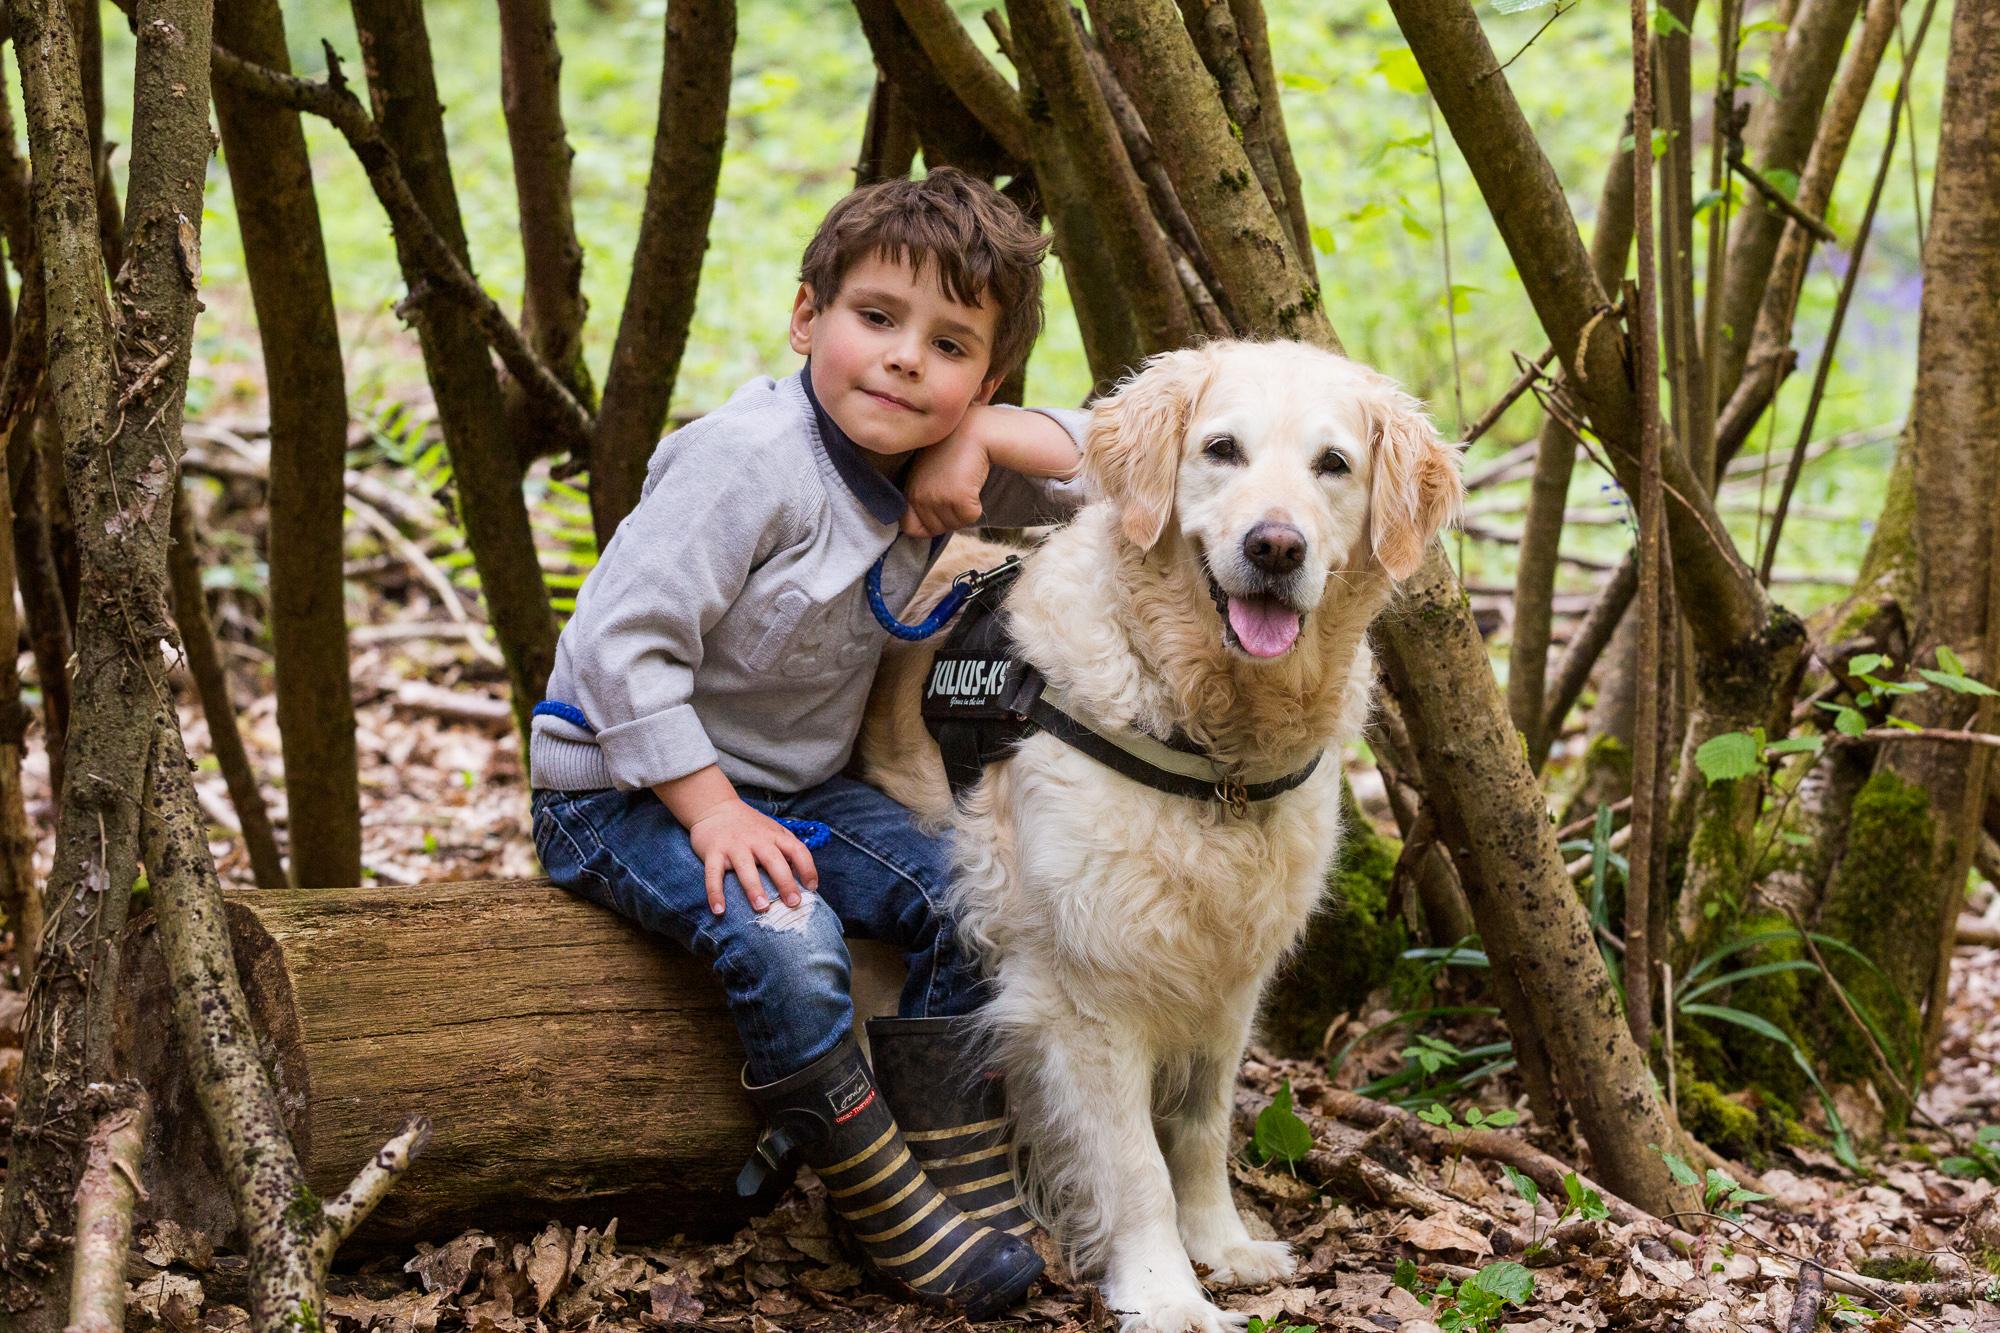 Woodland Boy and Dog Portrait